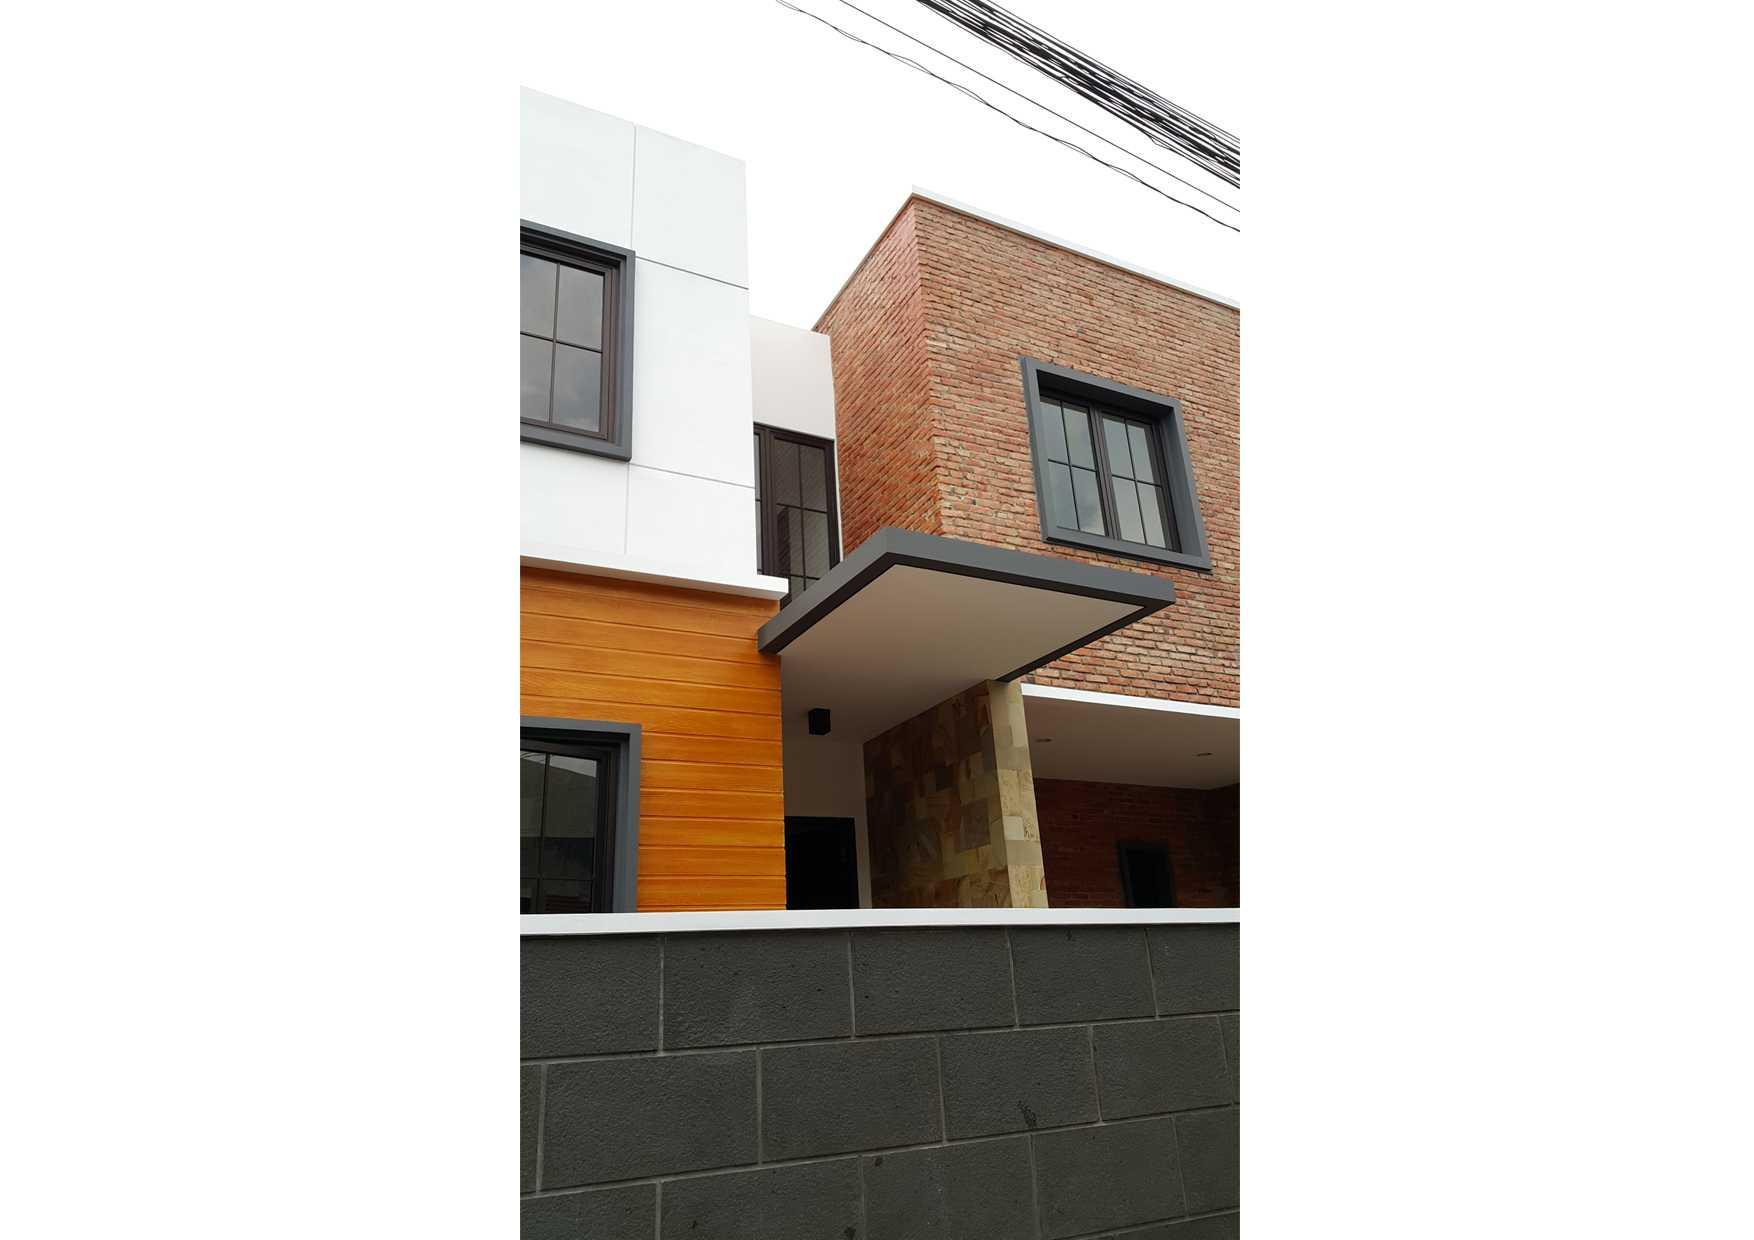 Bral Architect Satria Residence Pasar Minggu, South Jakarta City, Jakarta, Indonesia Pasar Minggu, Jakarta Satria-Depan-2 Modern  24916